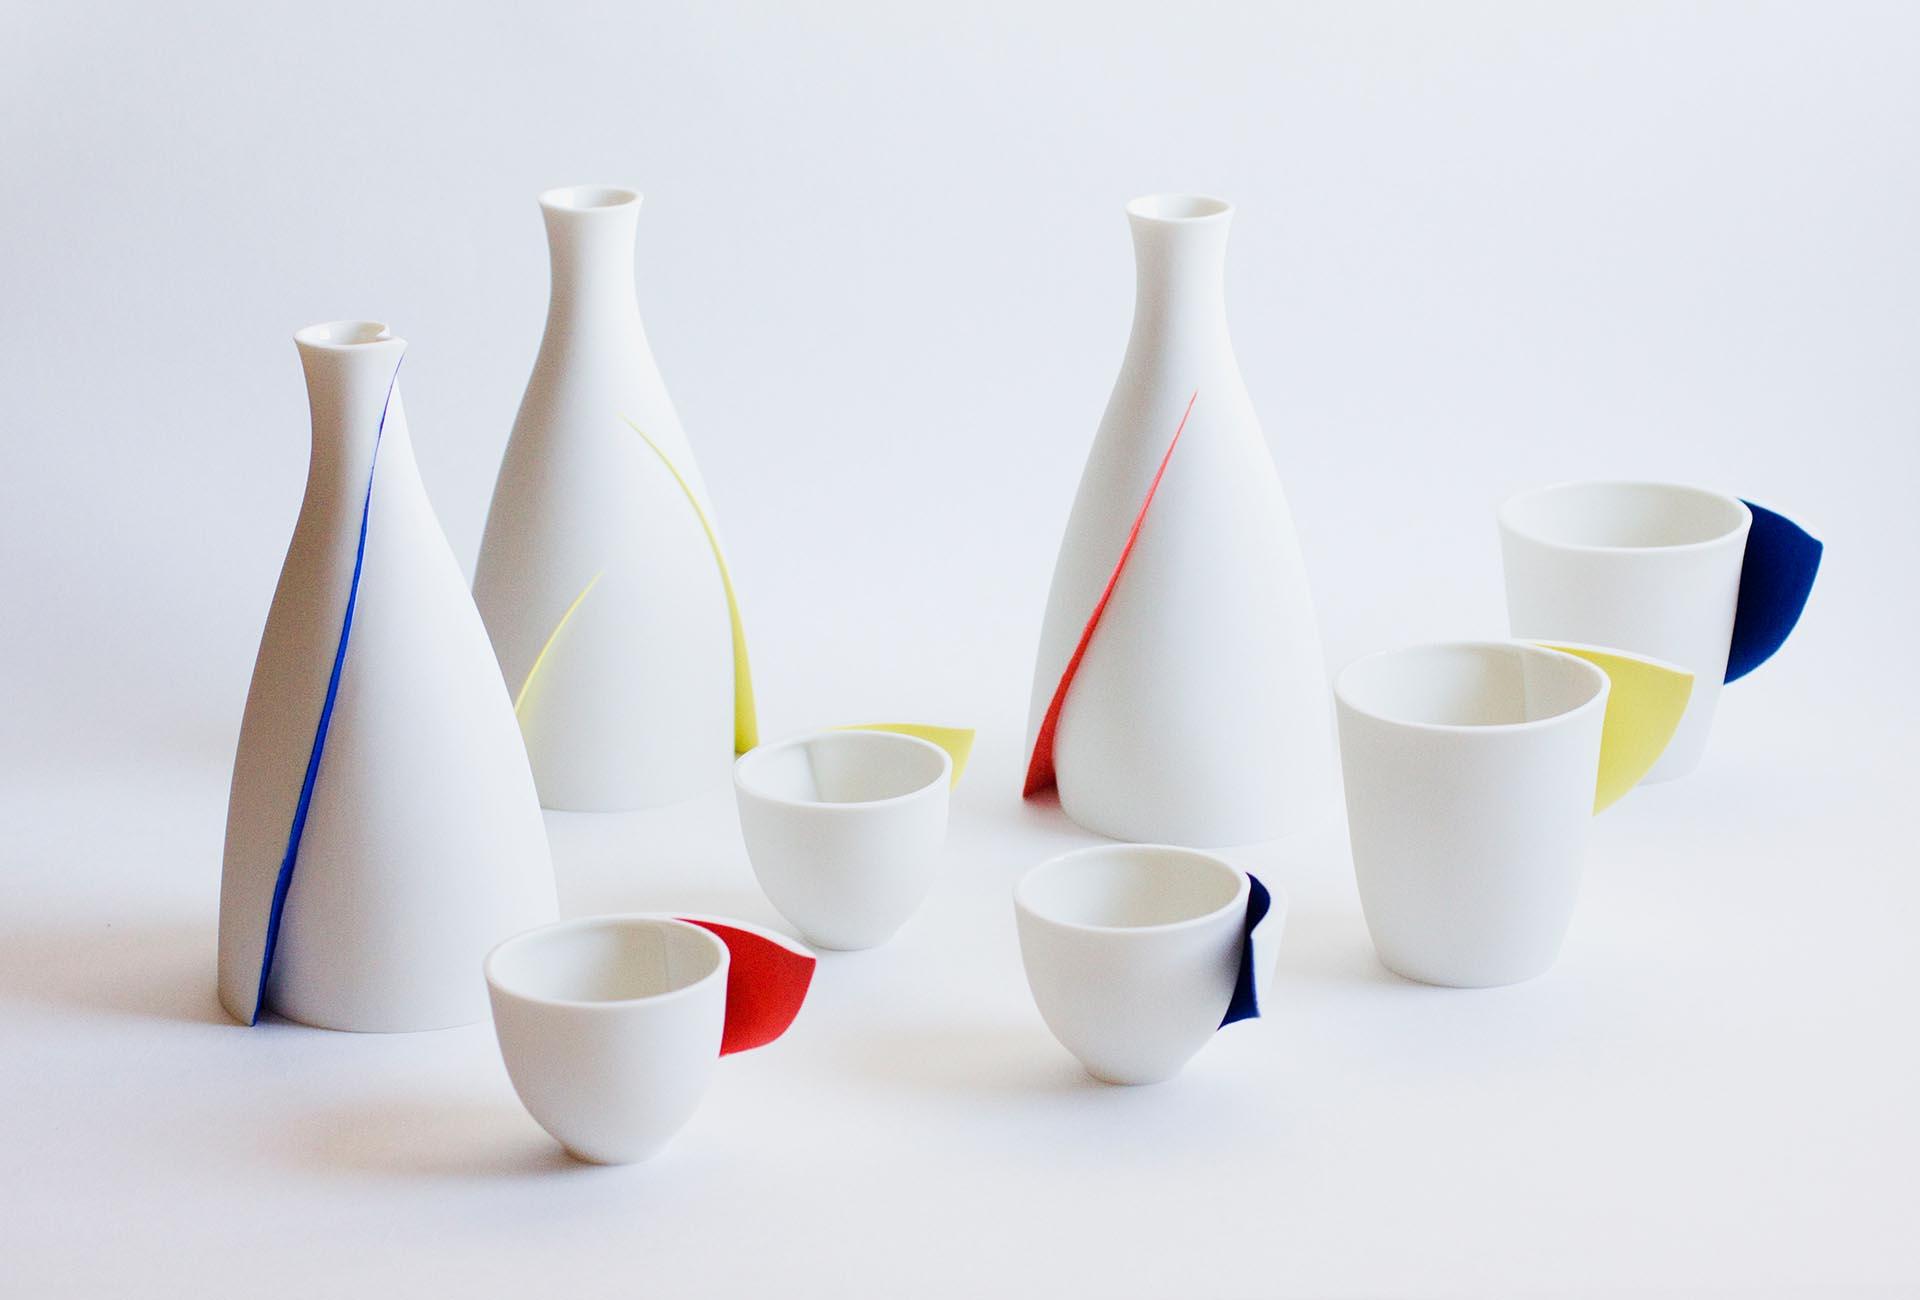 Atsushi Kitahata, Keramik